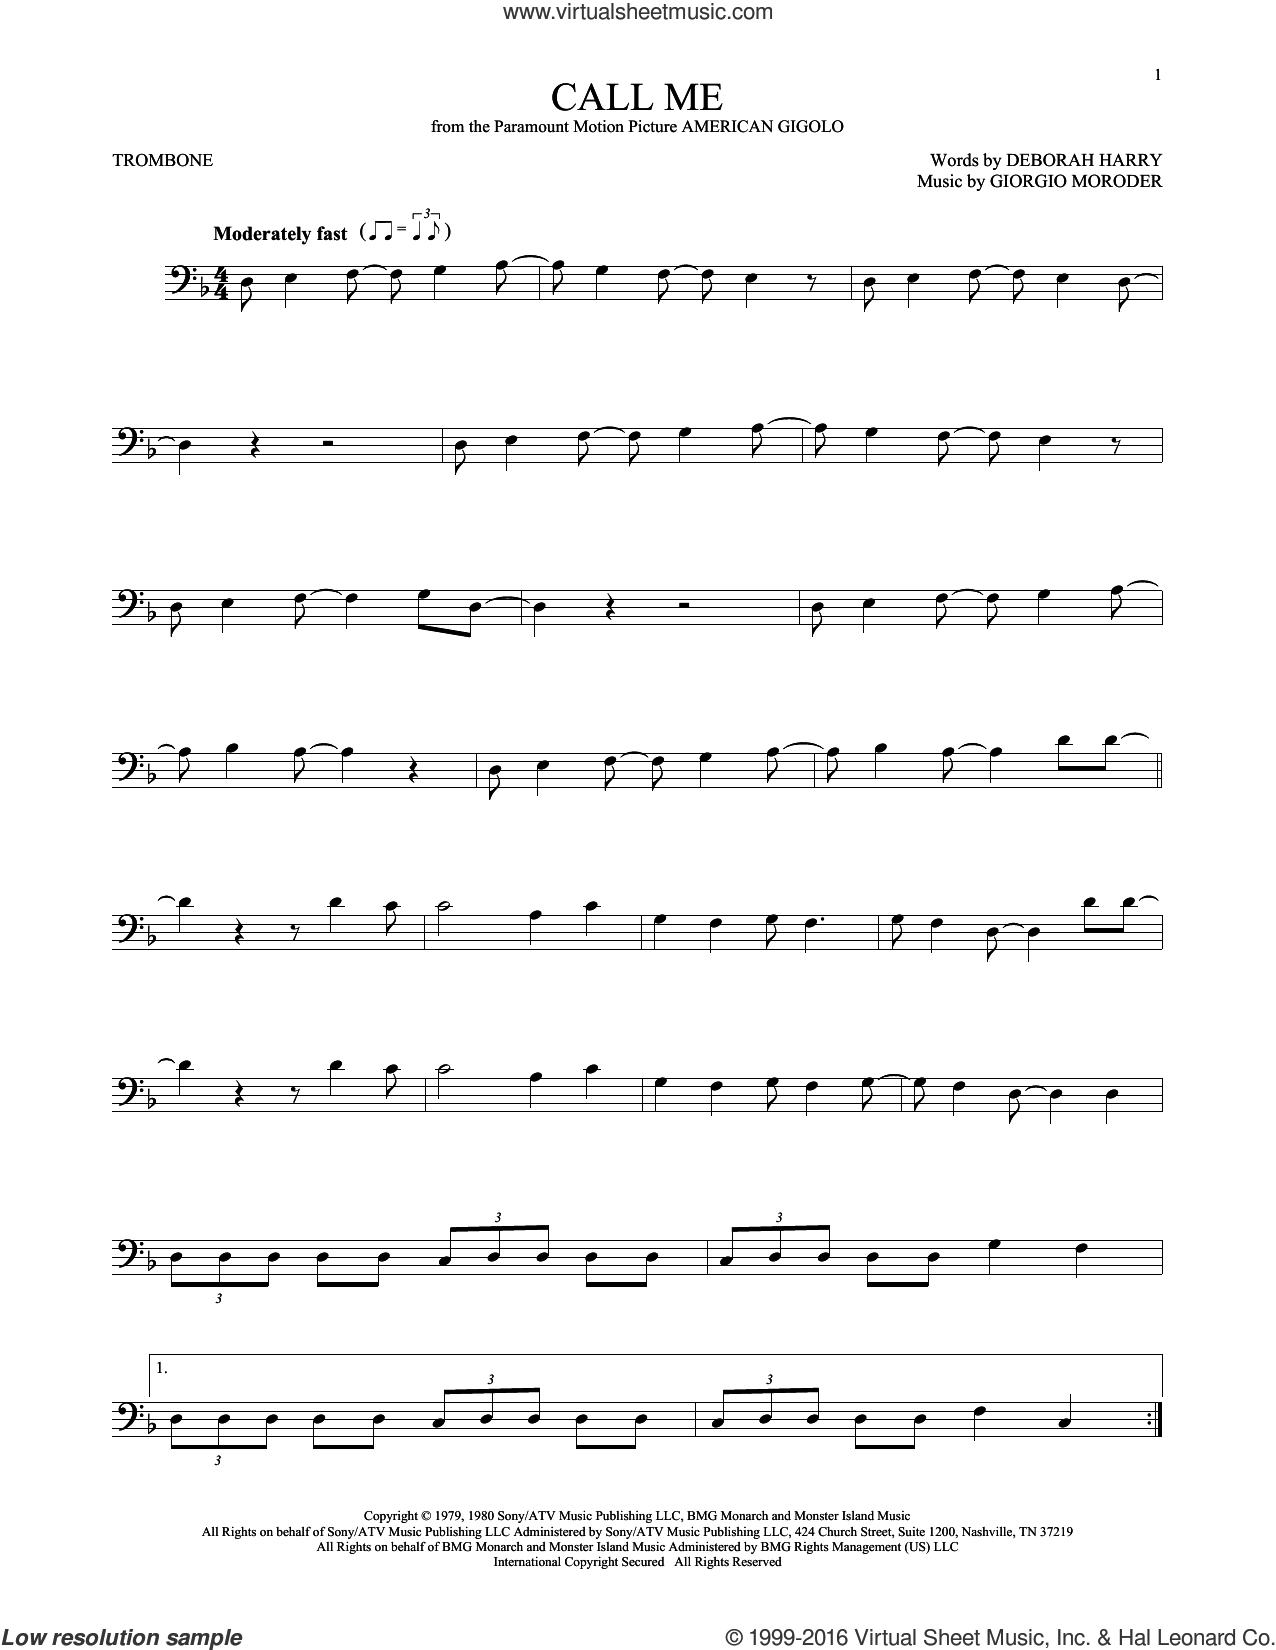 Call Me sheet music for trombone solo by Blondie, Deborah Harry and Giorgio Moroder, intermediate skill level